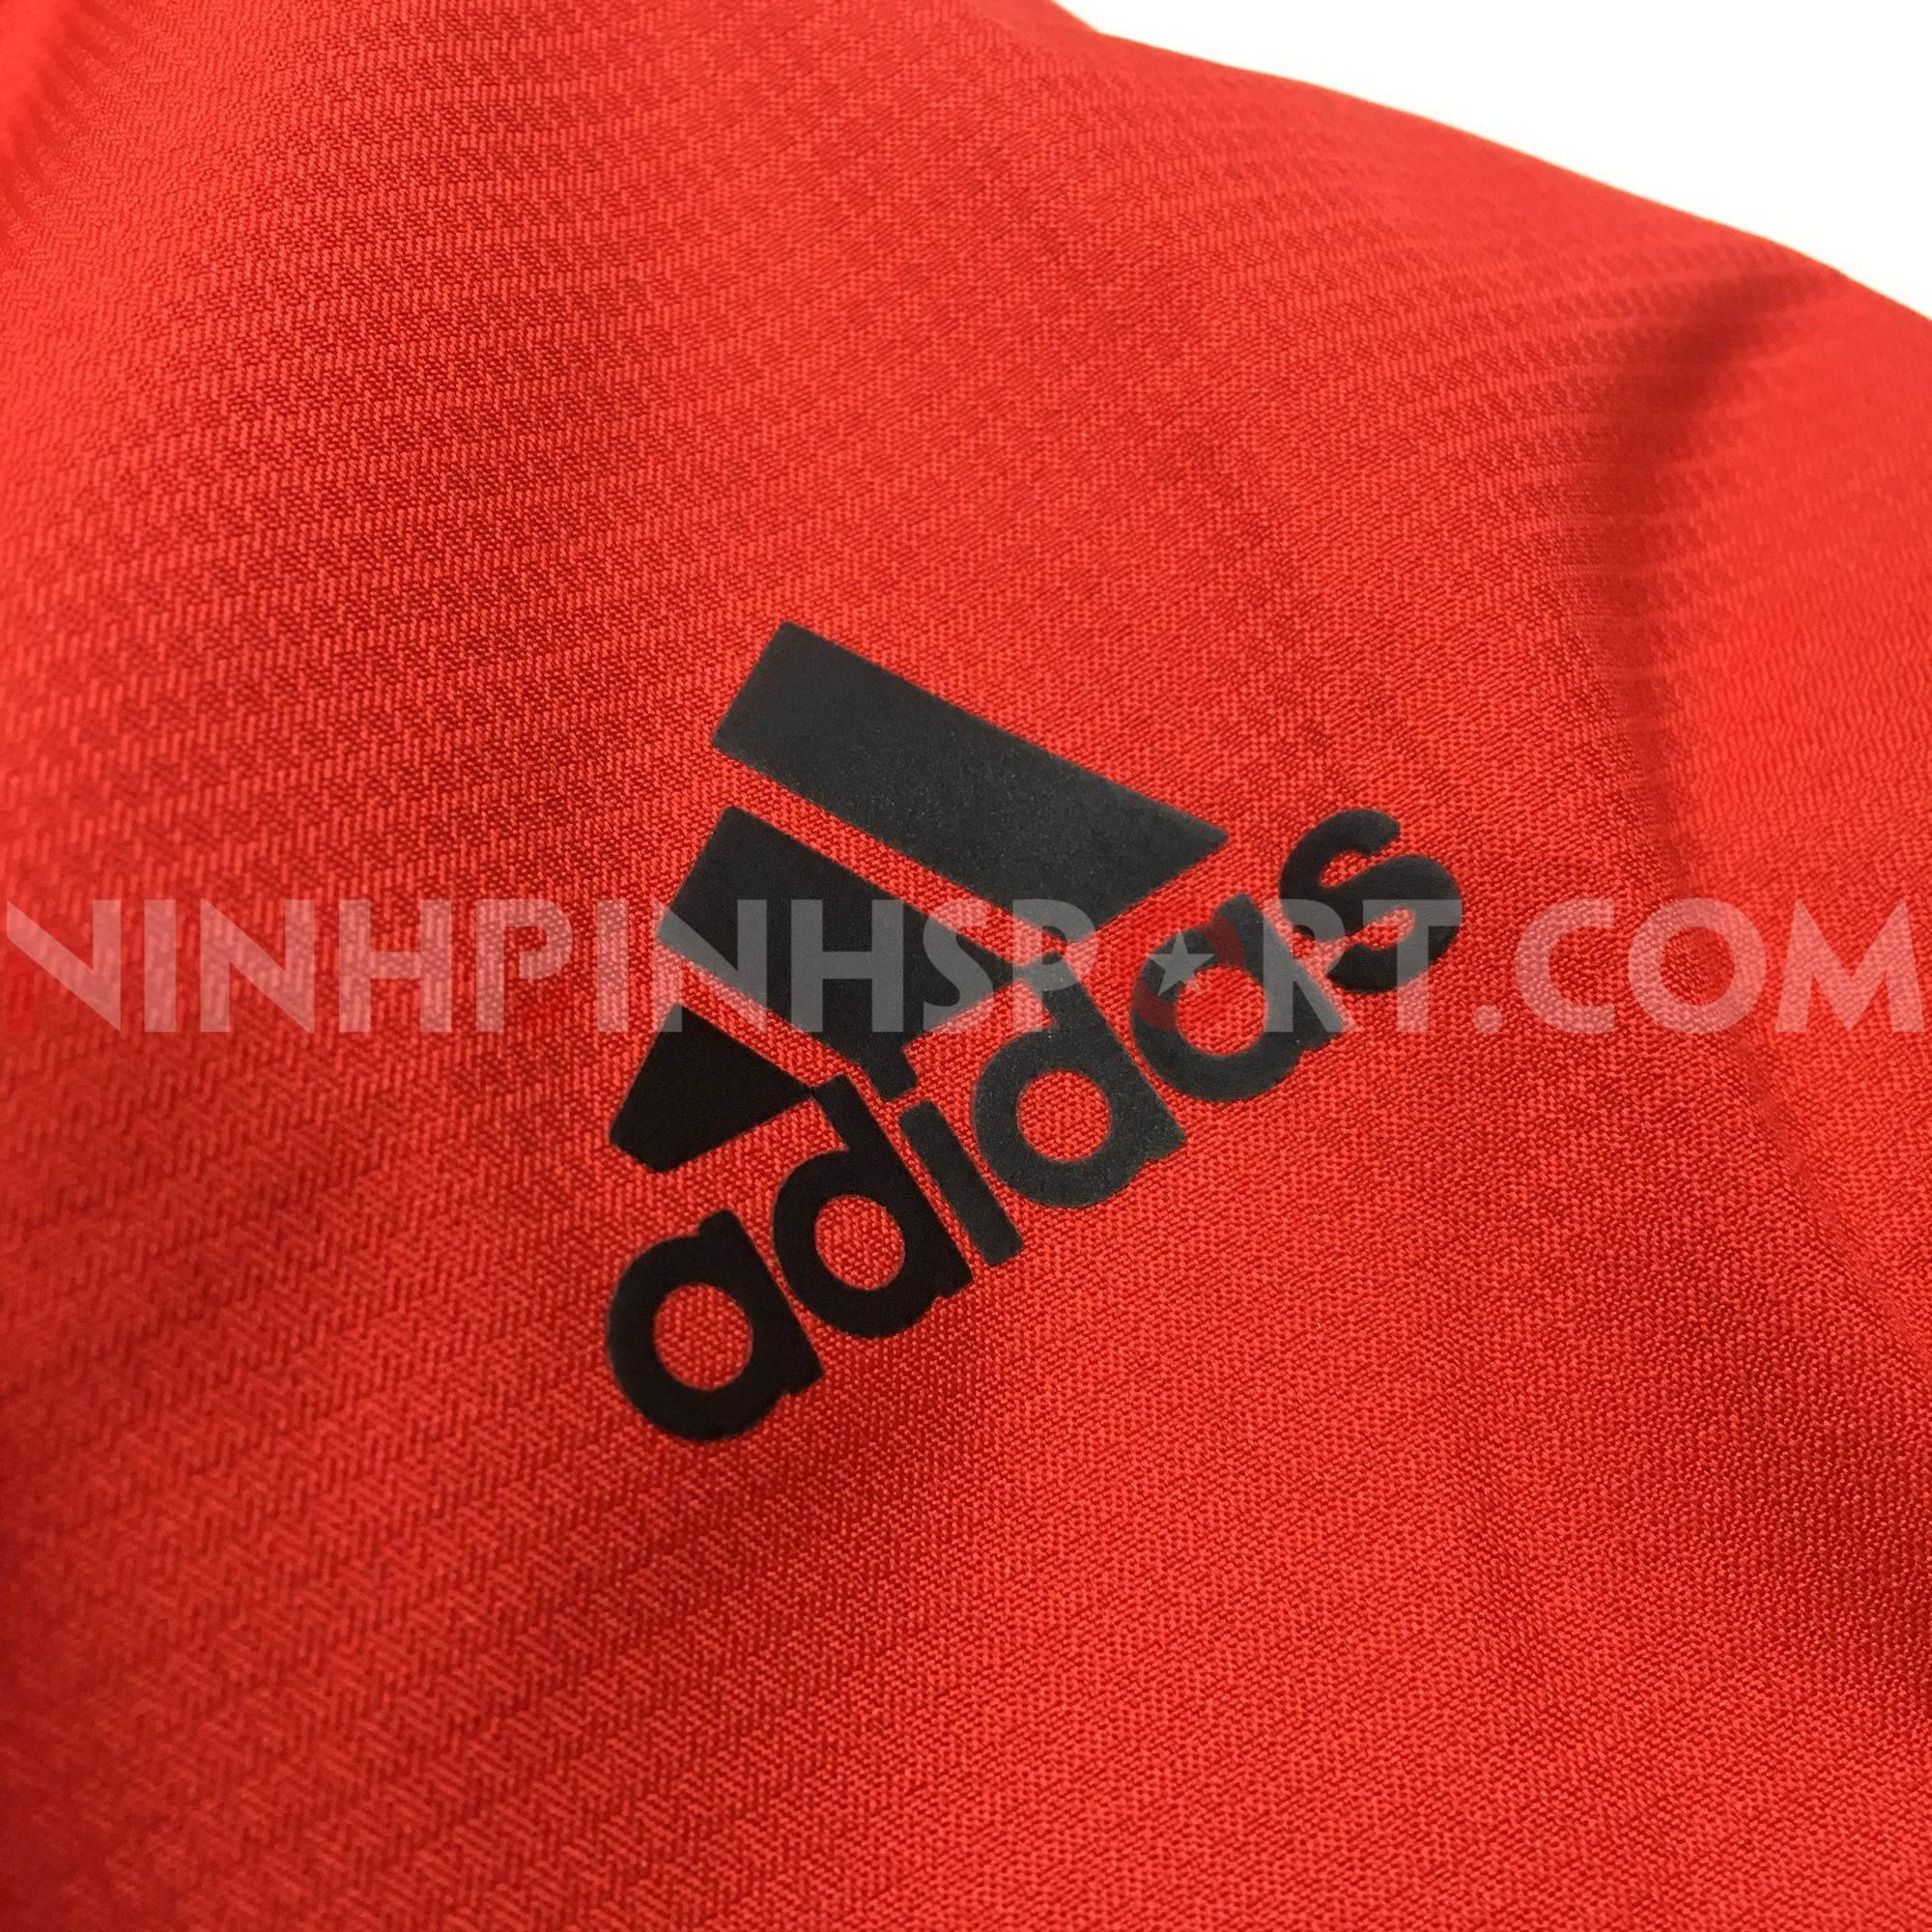 Áo khoác thể thao nam Adidas Chaqueta Hiking Day Red AP8350